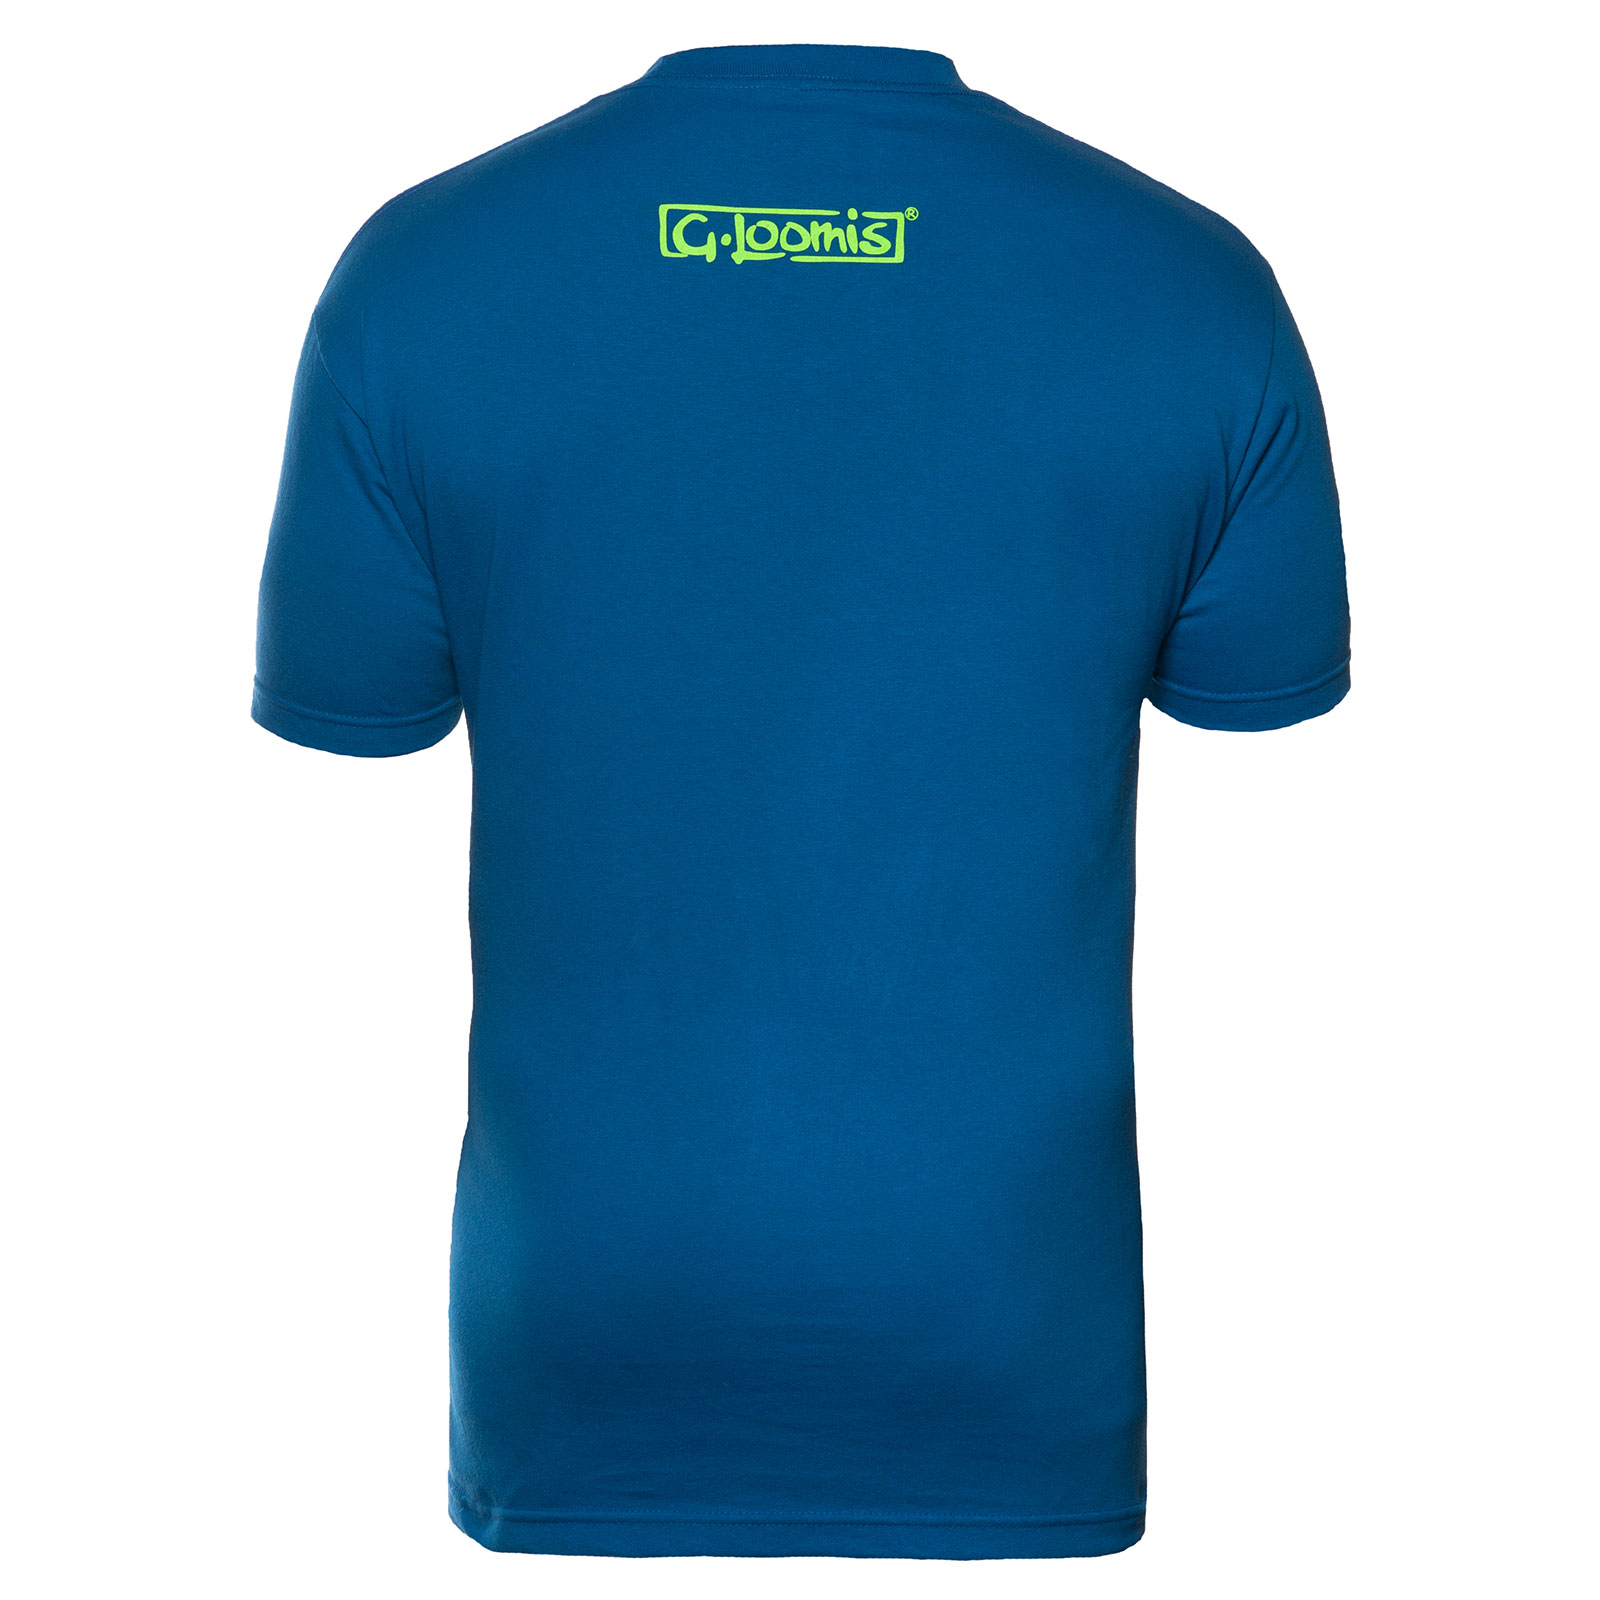 G-Loomis-Skeleton-Fish-Corpo-Short-Sleeve-Fishing-T-Shirt-Select-Size-amp-Color thumbnail 3